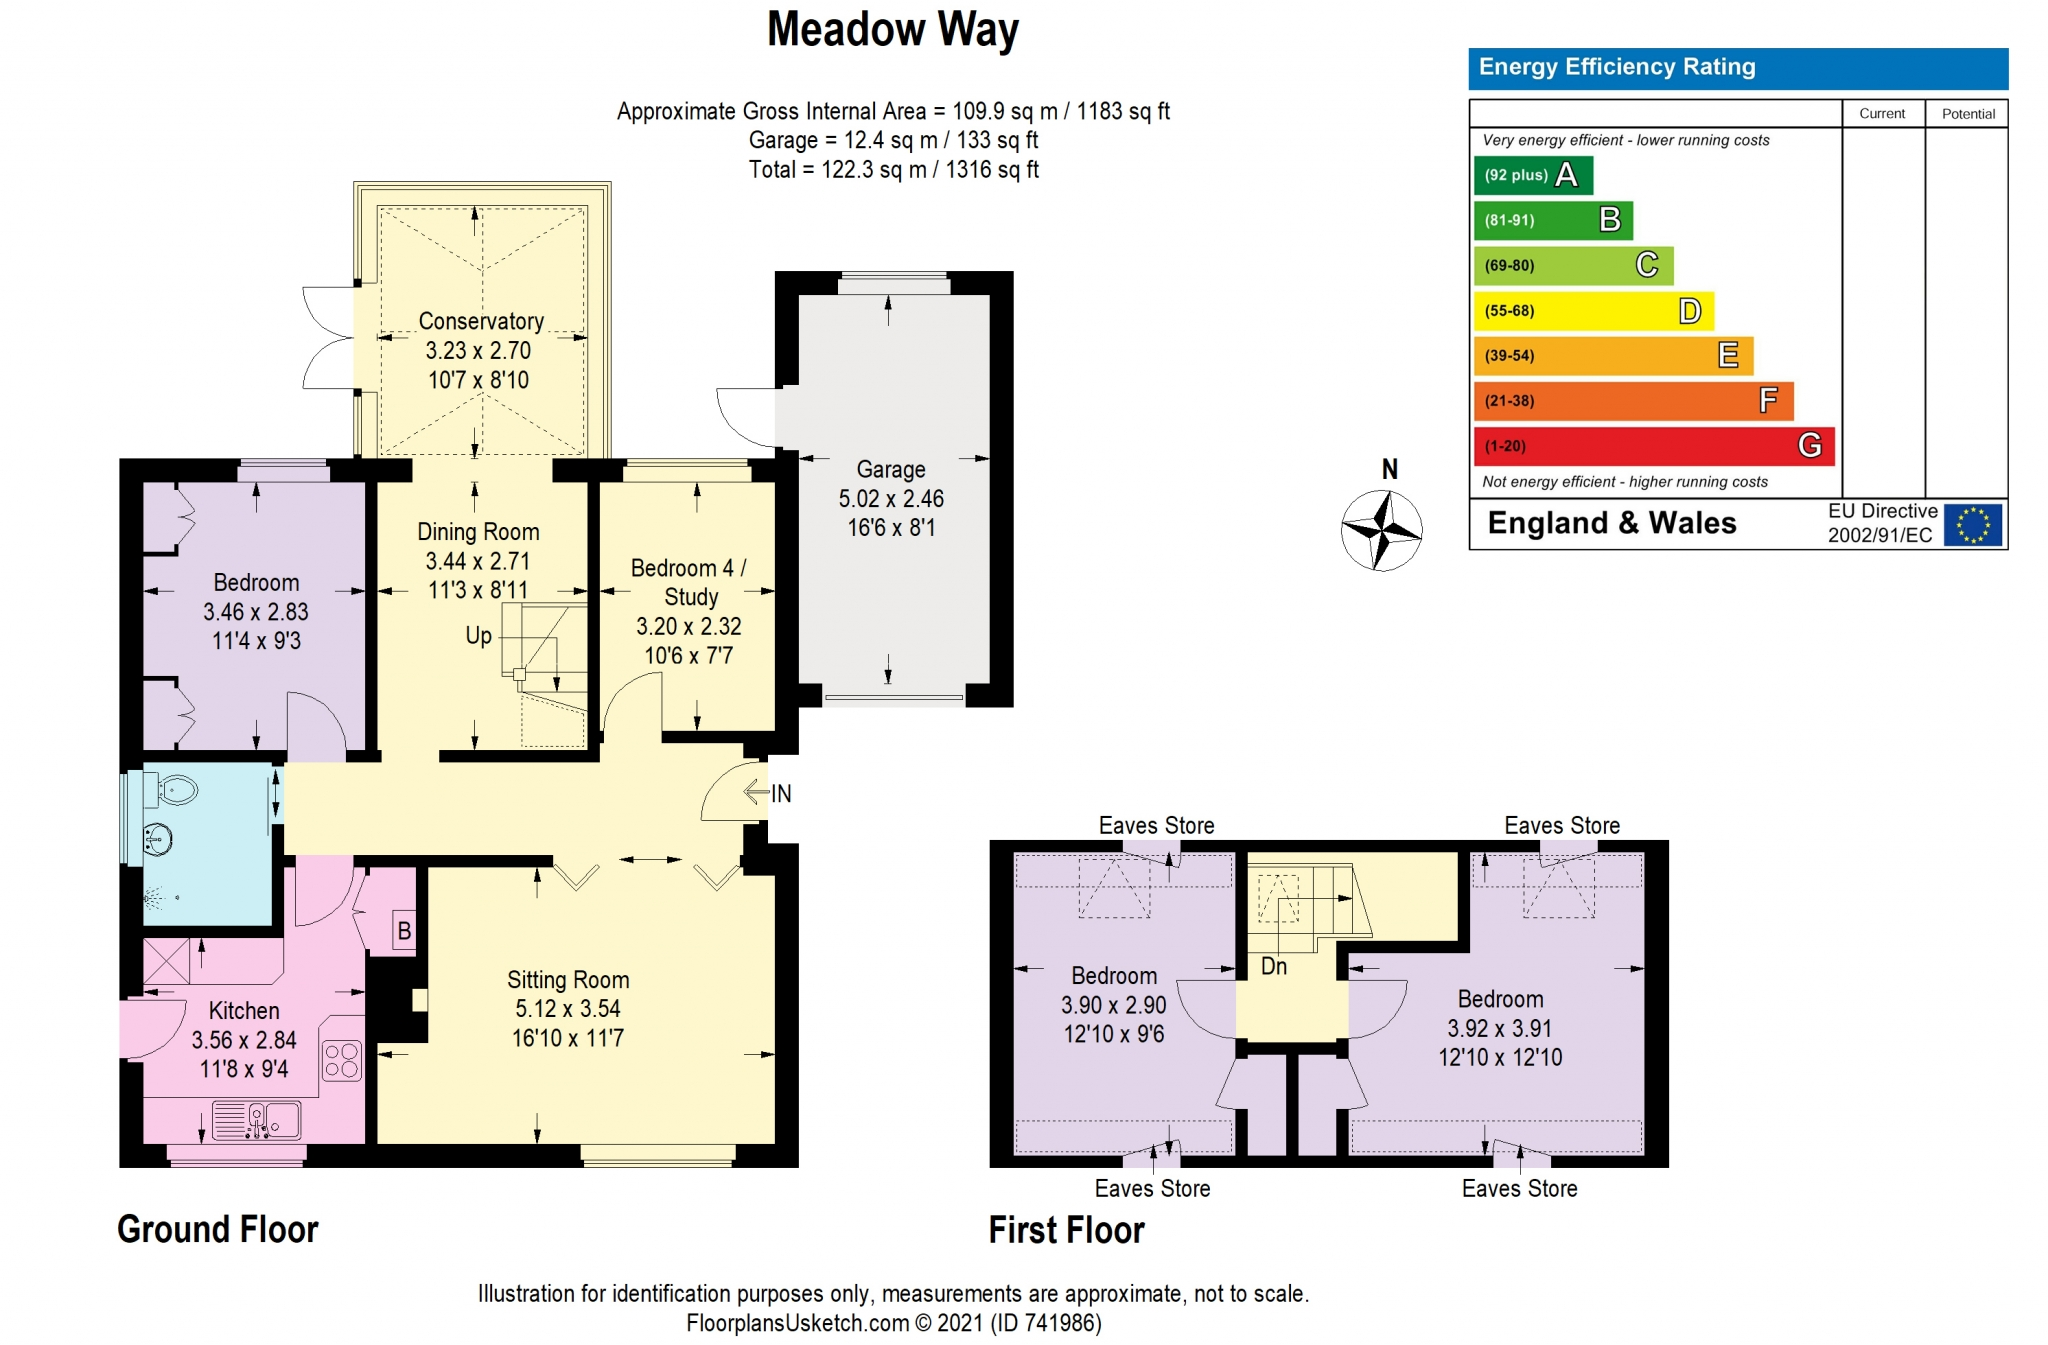 Final_741986_meadow-way-bpc0_190321201648950